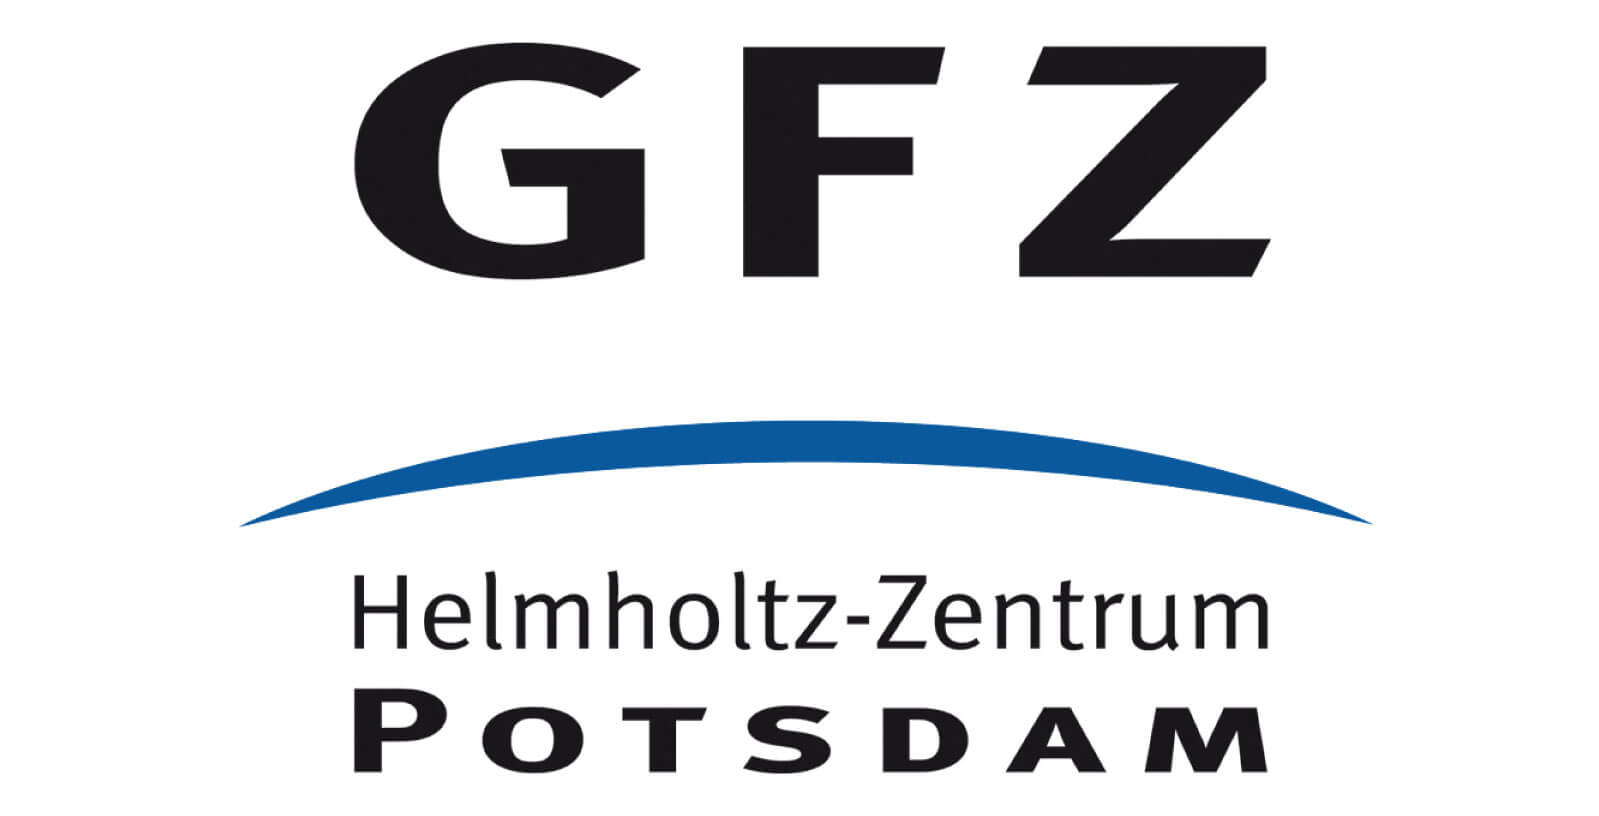 Gfz German Research Centre For Geosciences